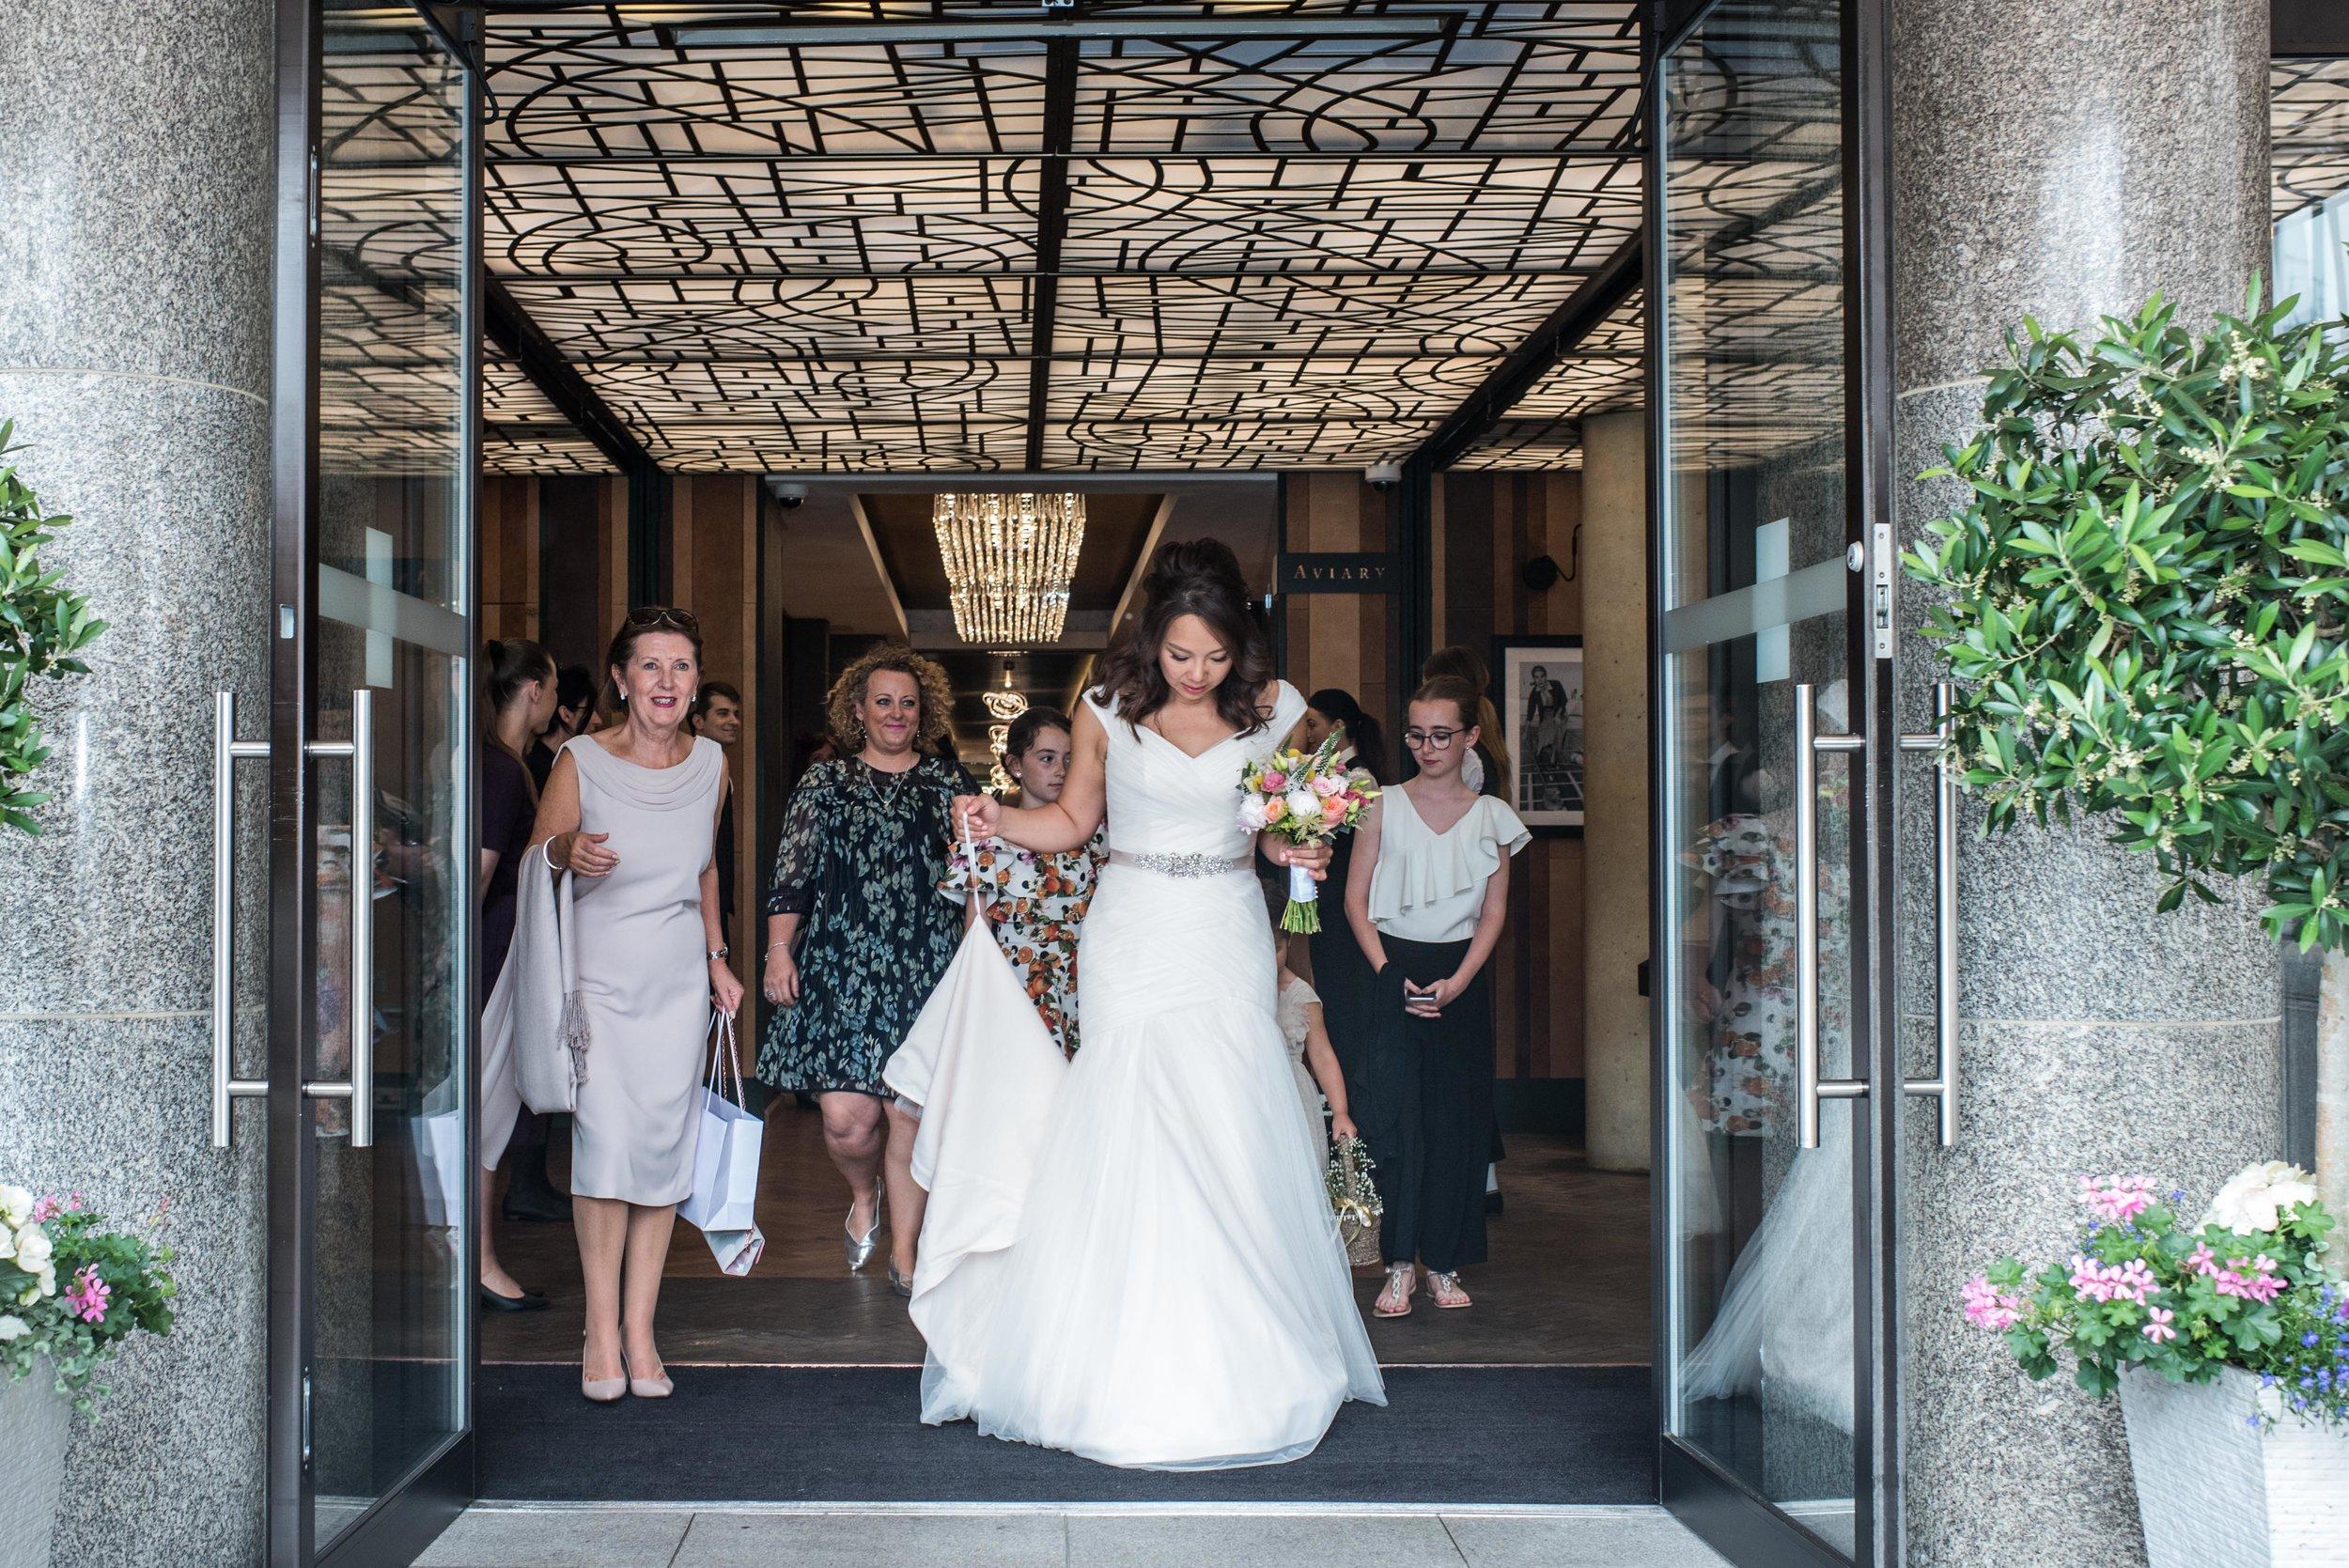 D&M_Marylebone Town Hall Wedding (44 of 239).jpg